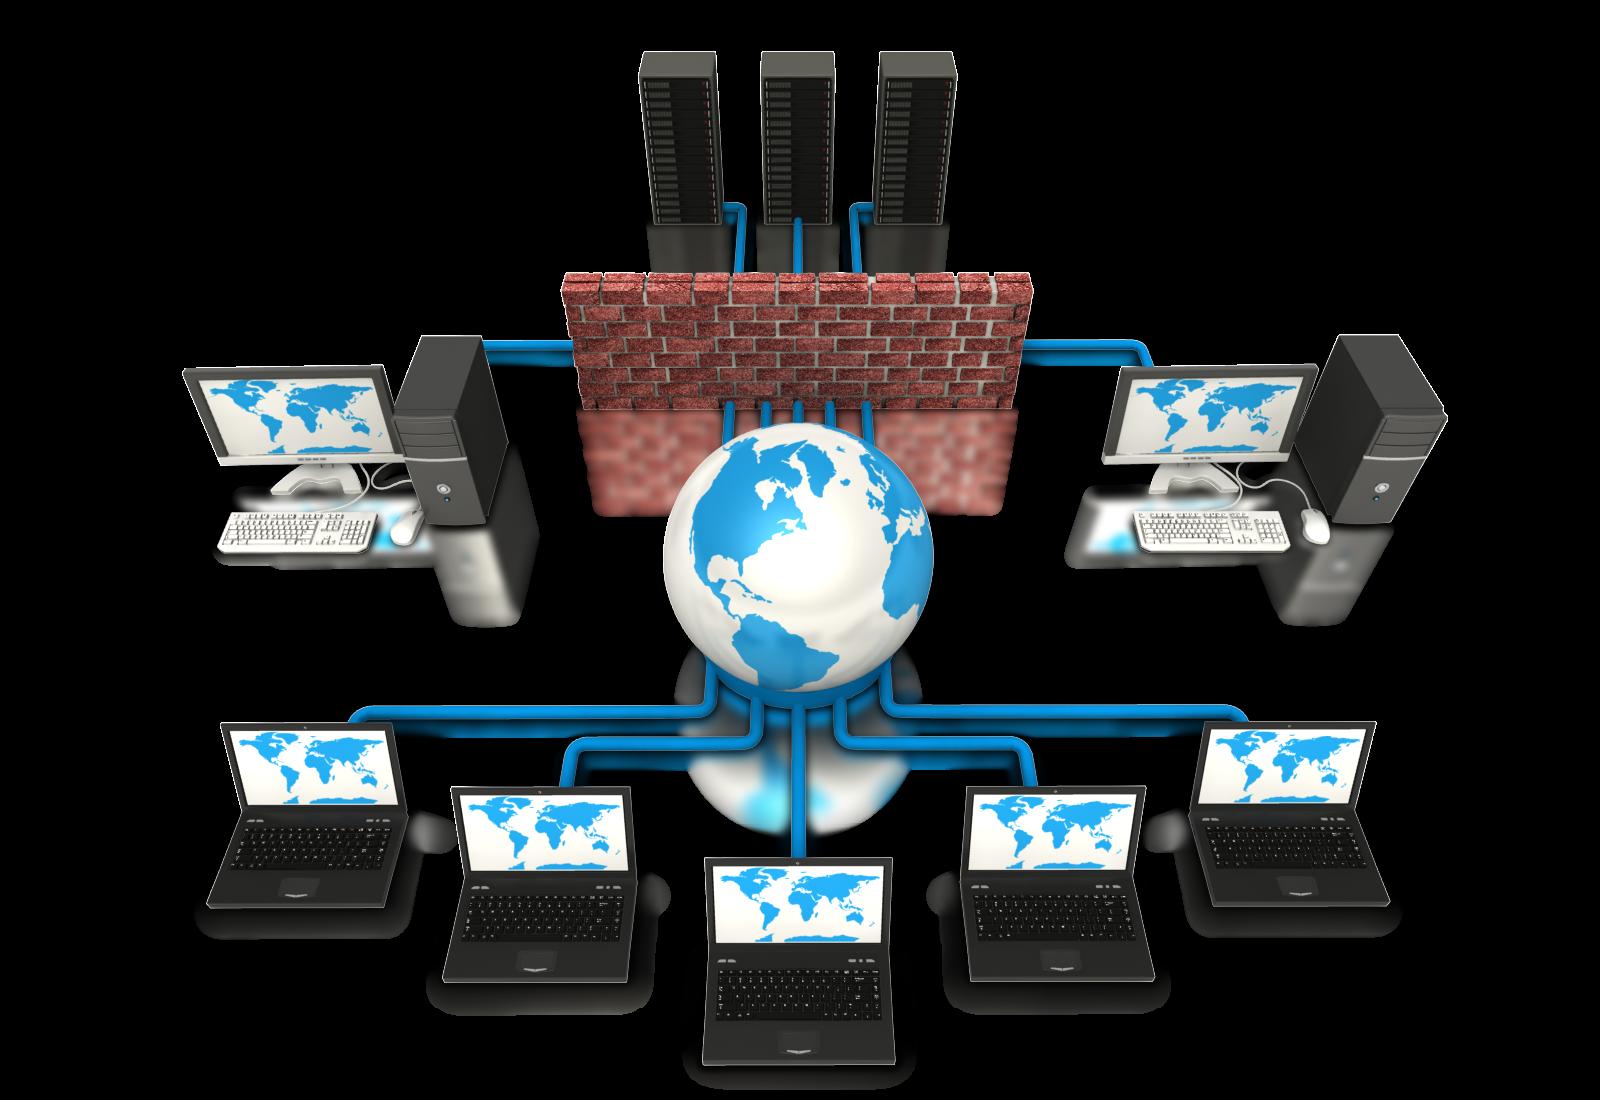 vpn free, vpn server, vpn network